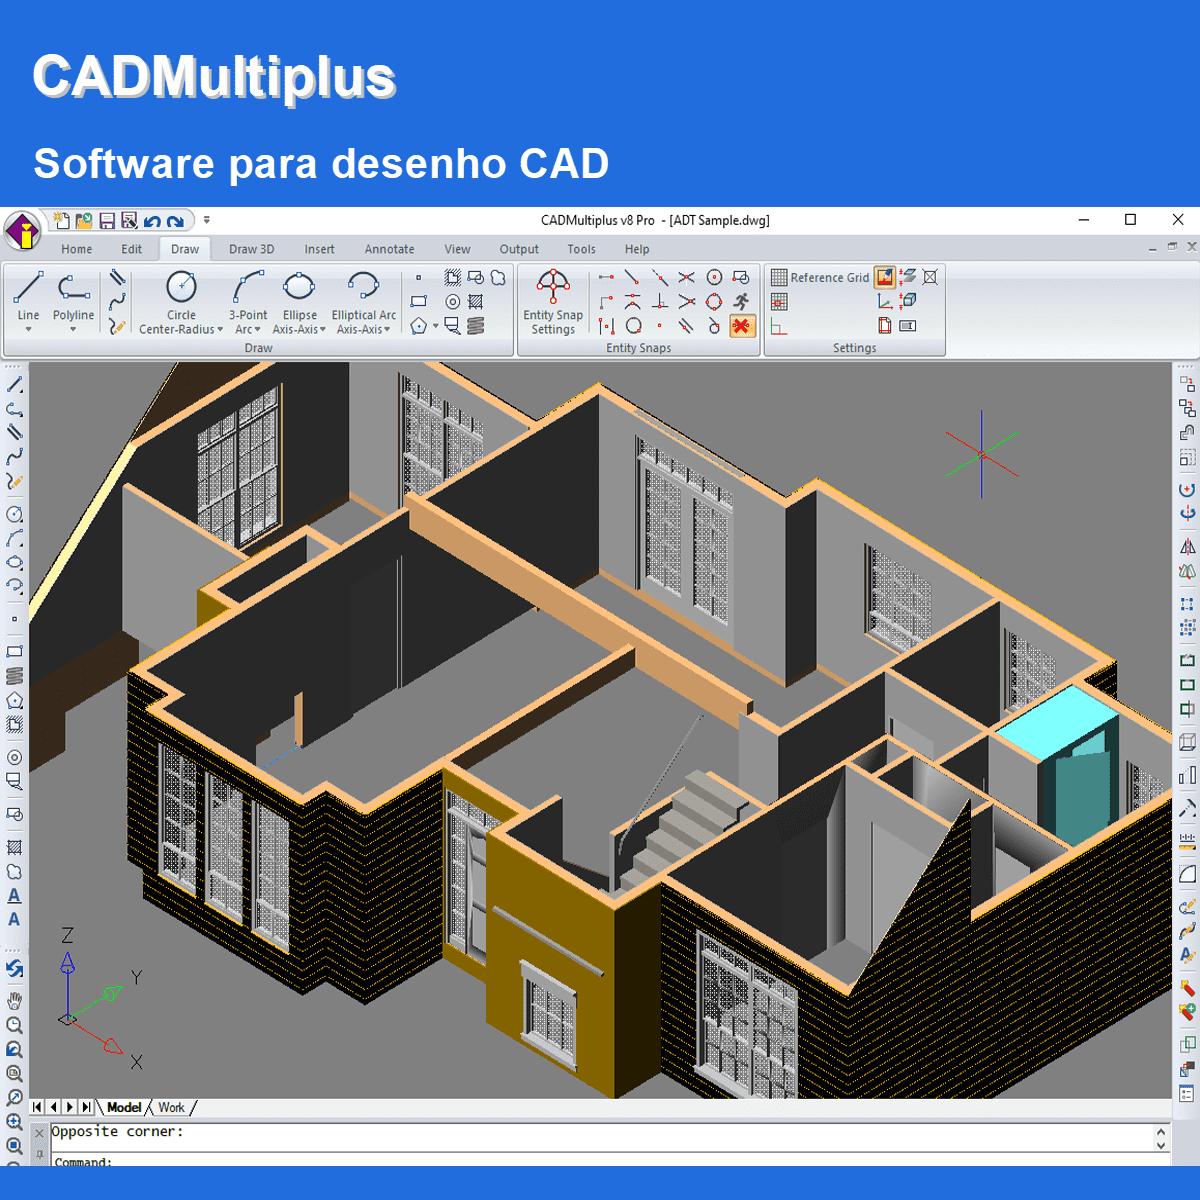 Software CADMultiplus pacote PRO versão V8